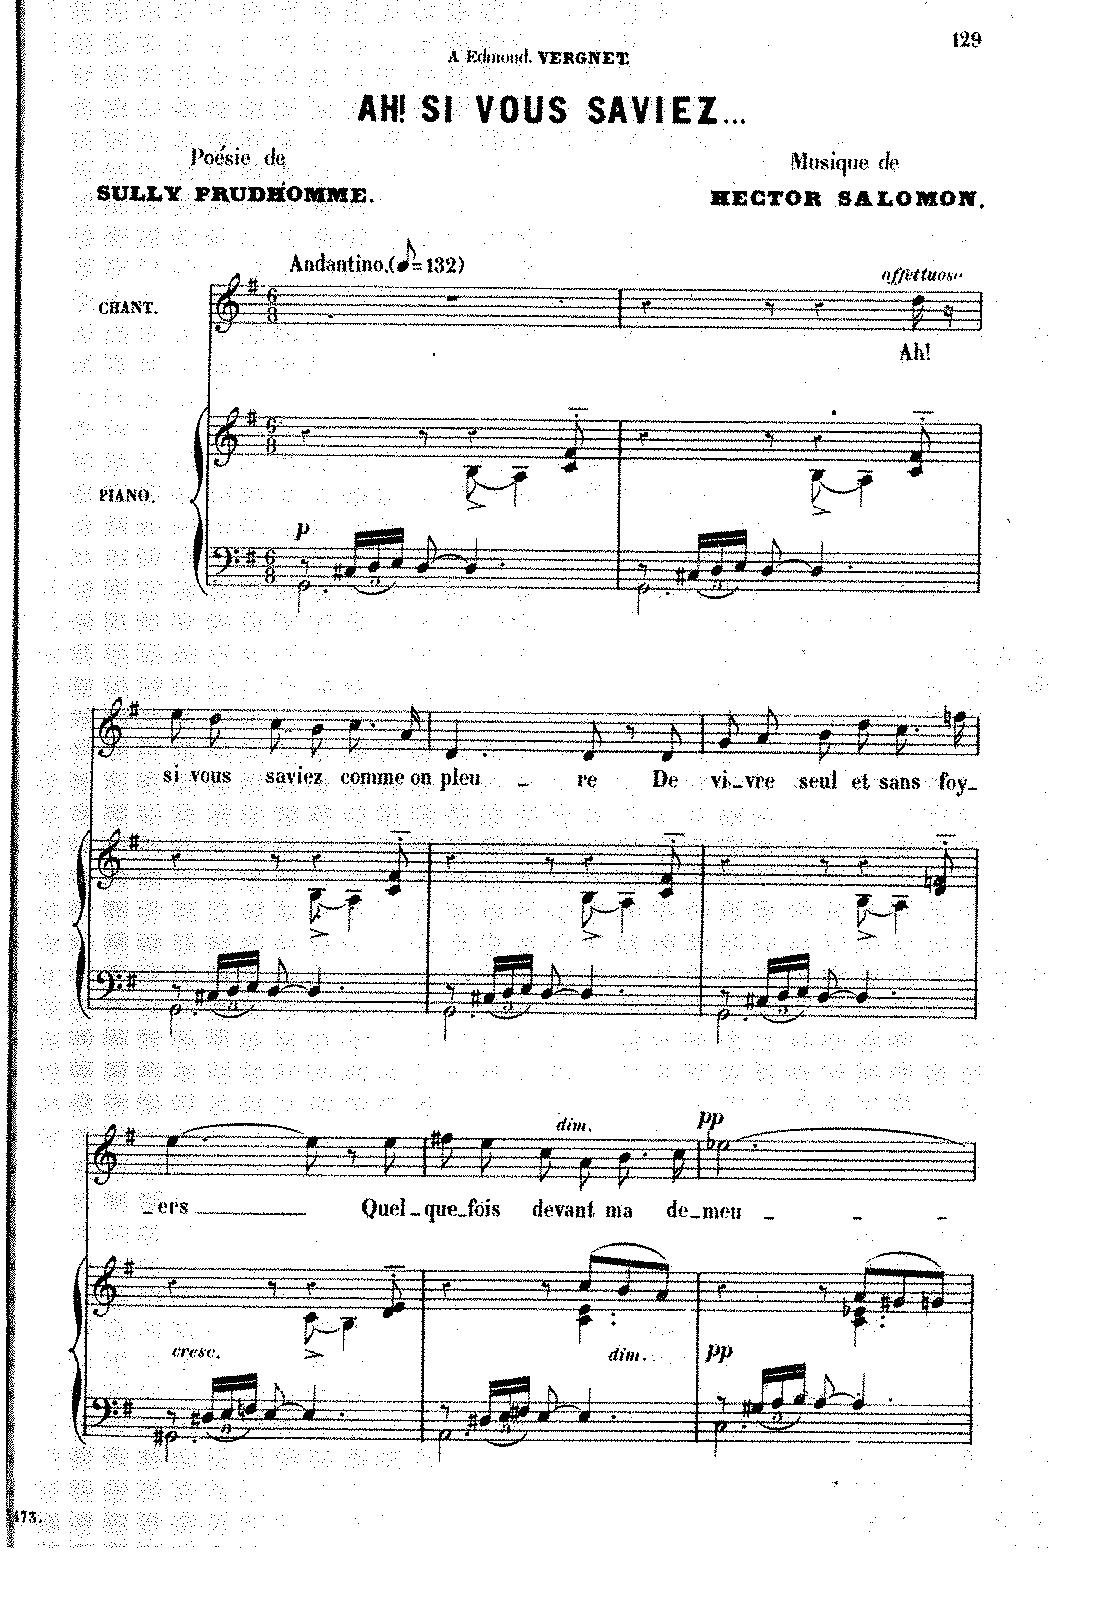 Ah! si vous saviez (Salomon, Hector) - IMSLP/Petrucci Music Library